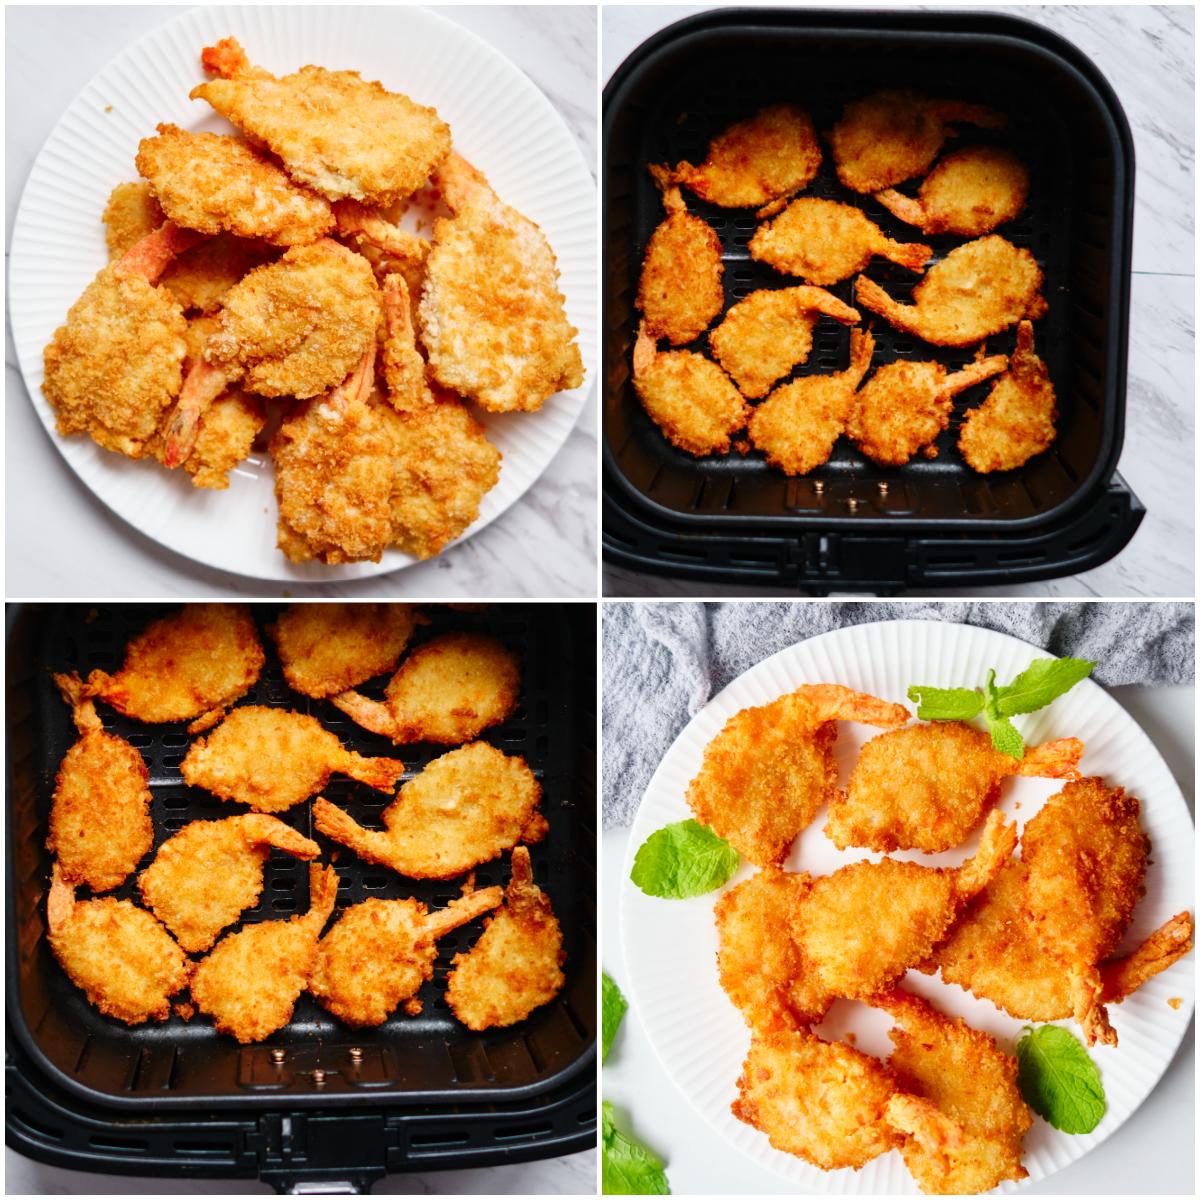 image collage showing the steps for making air fryer frozen shrimp